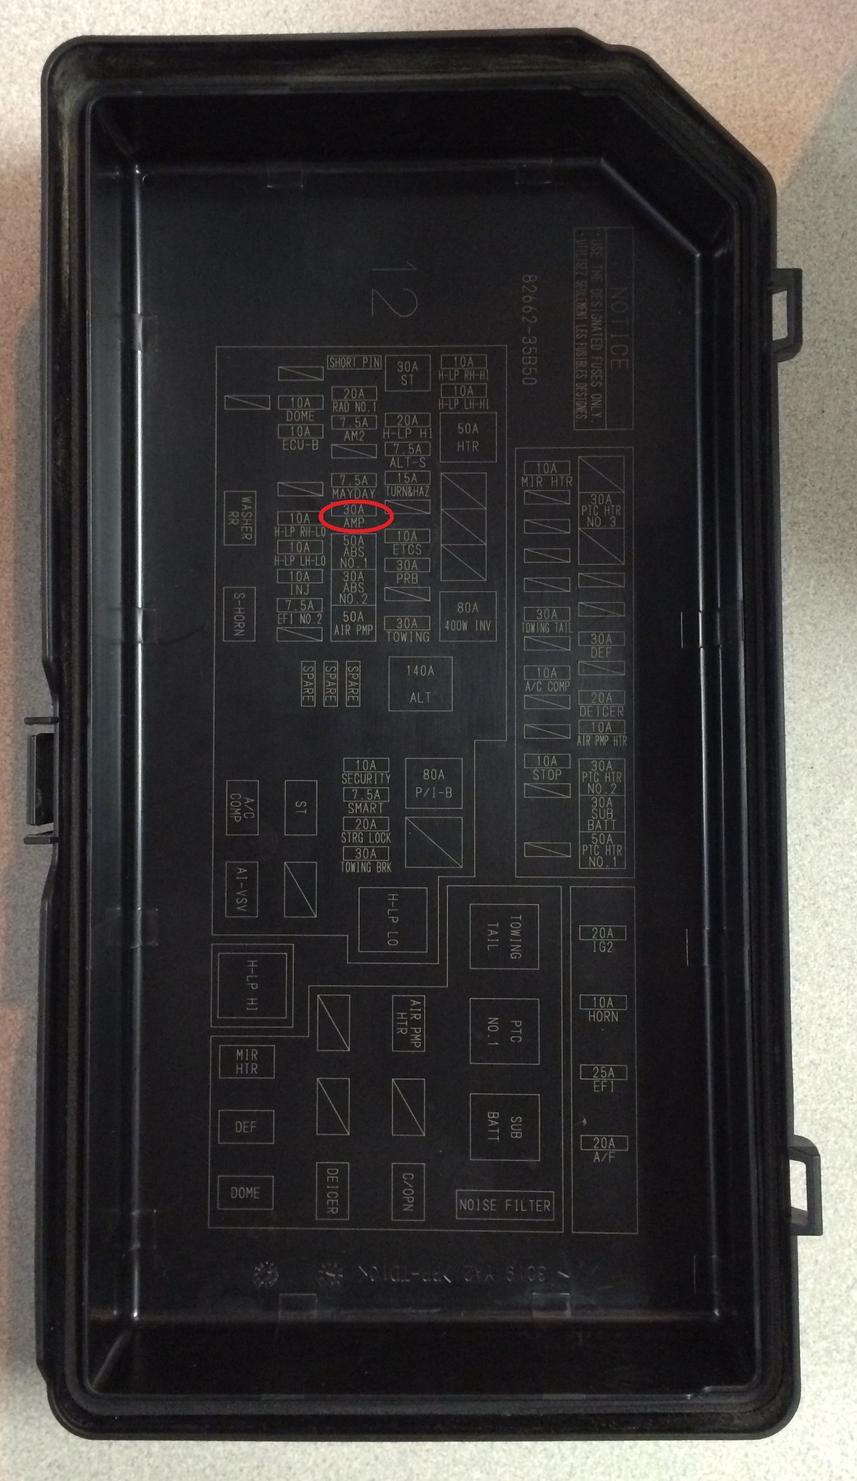 2014 4runner fuse box data wiring diagrams u2022 rh mikeadkinsguitar com  2015 toyota 4runner fuse diagram